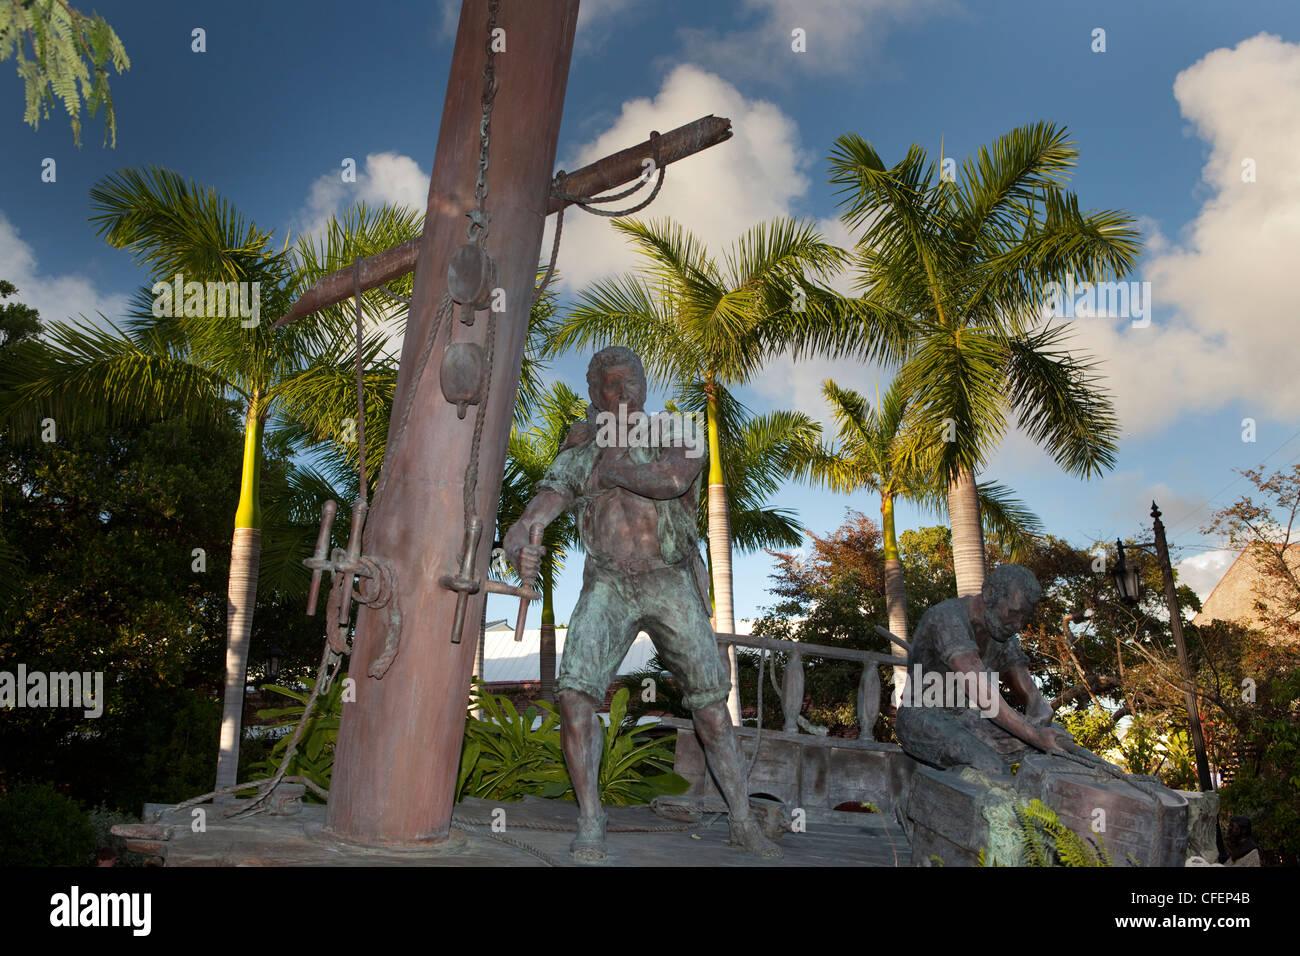 Mallory Square, key west, Florida, USA - Stock Image